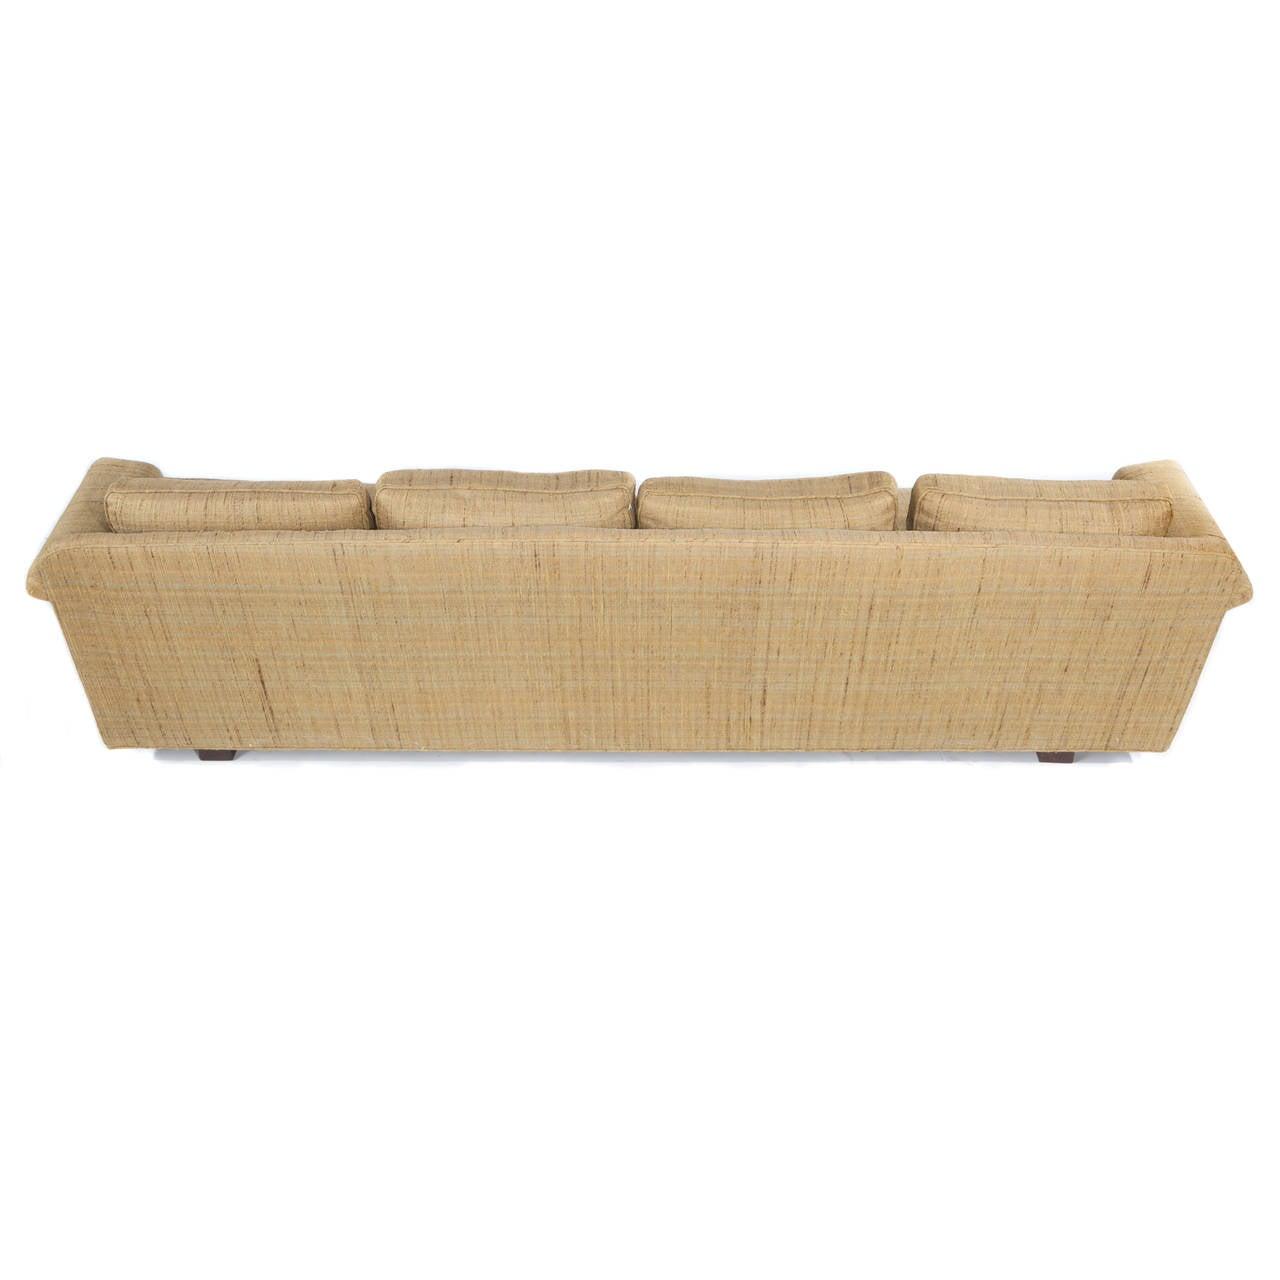 1950s Four-Seat Sofa by Edward Wormley for Dunbar 9